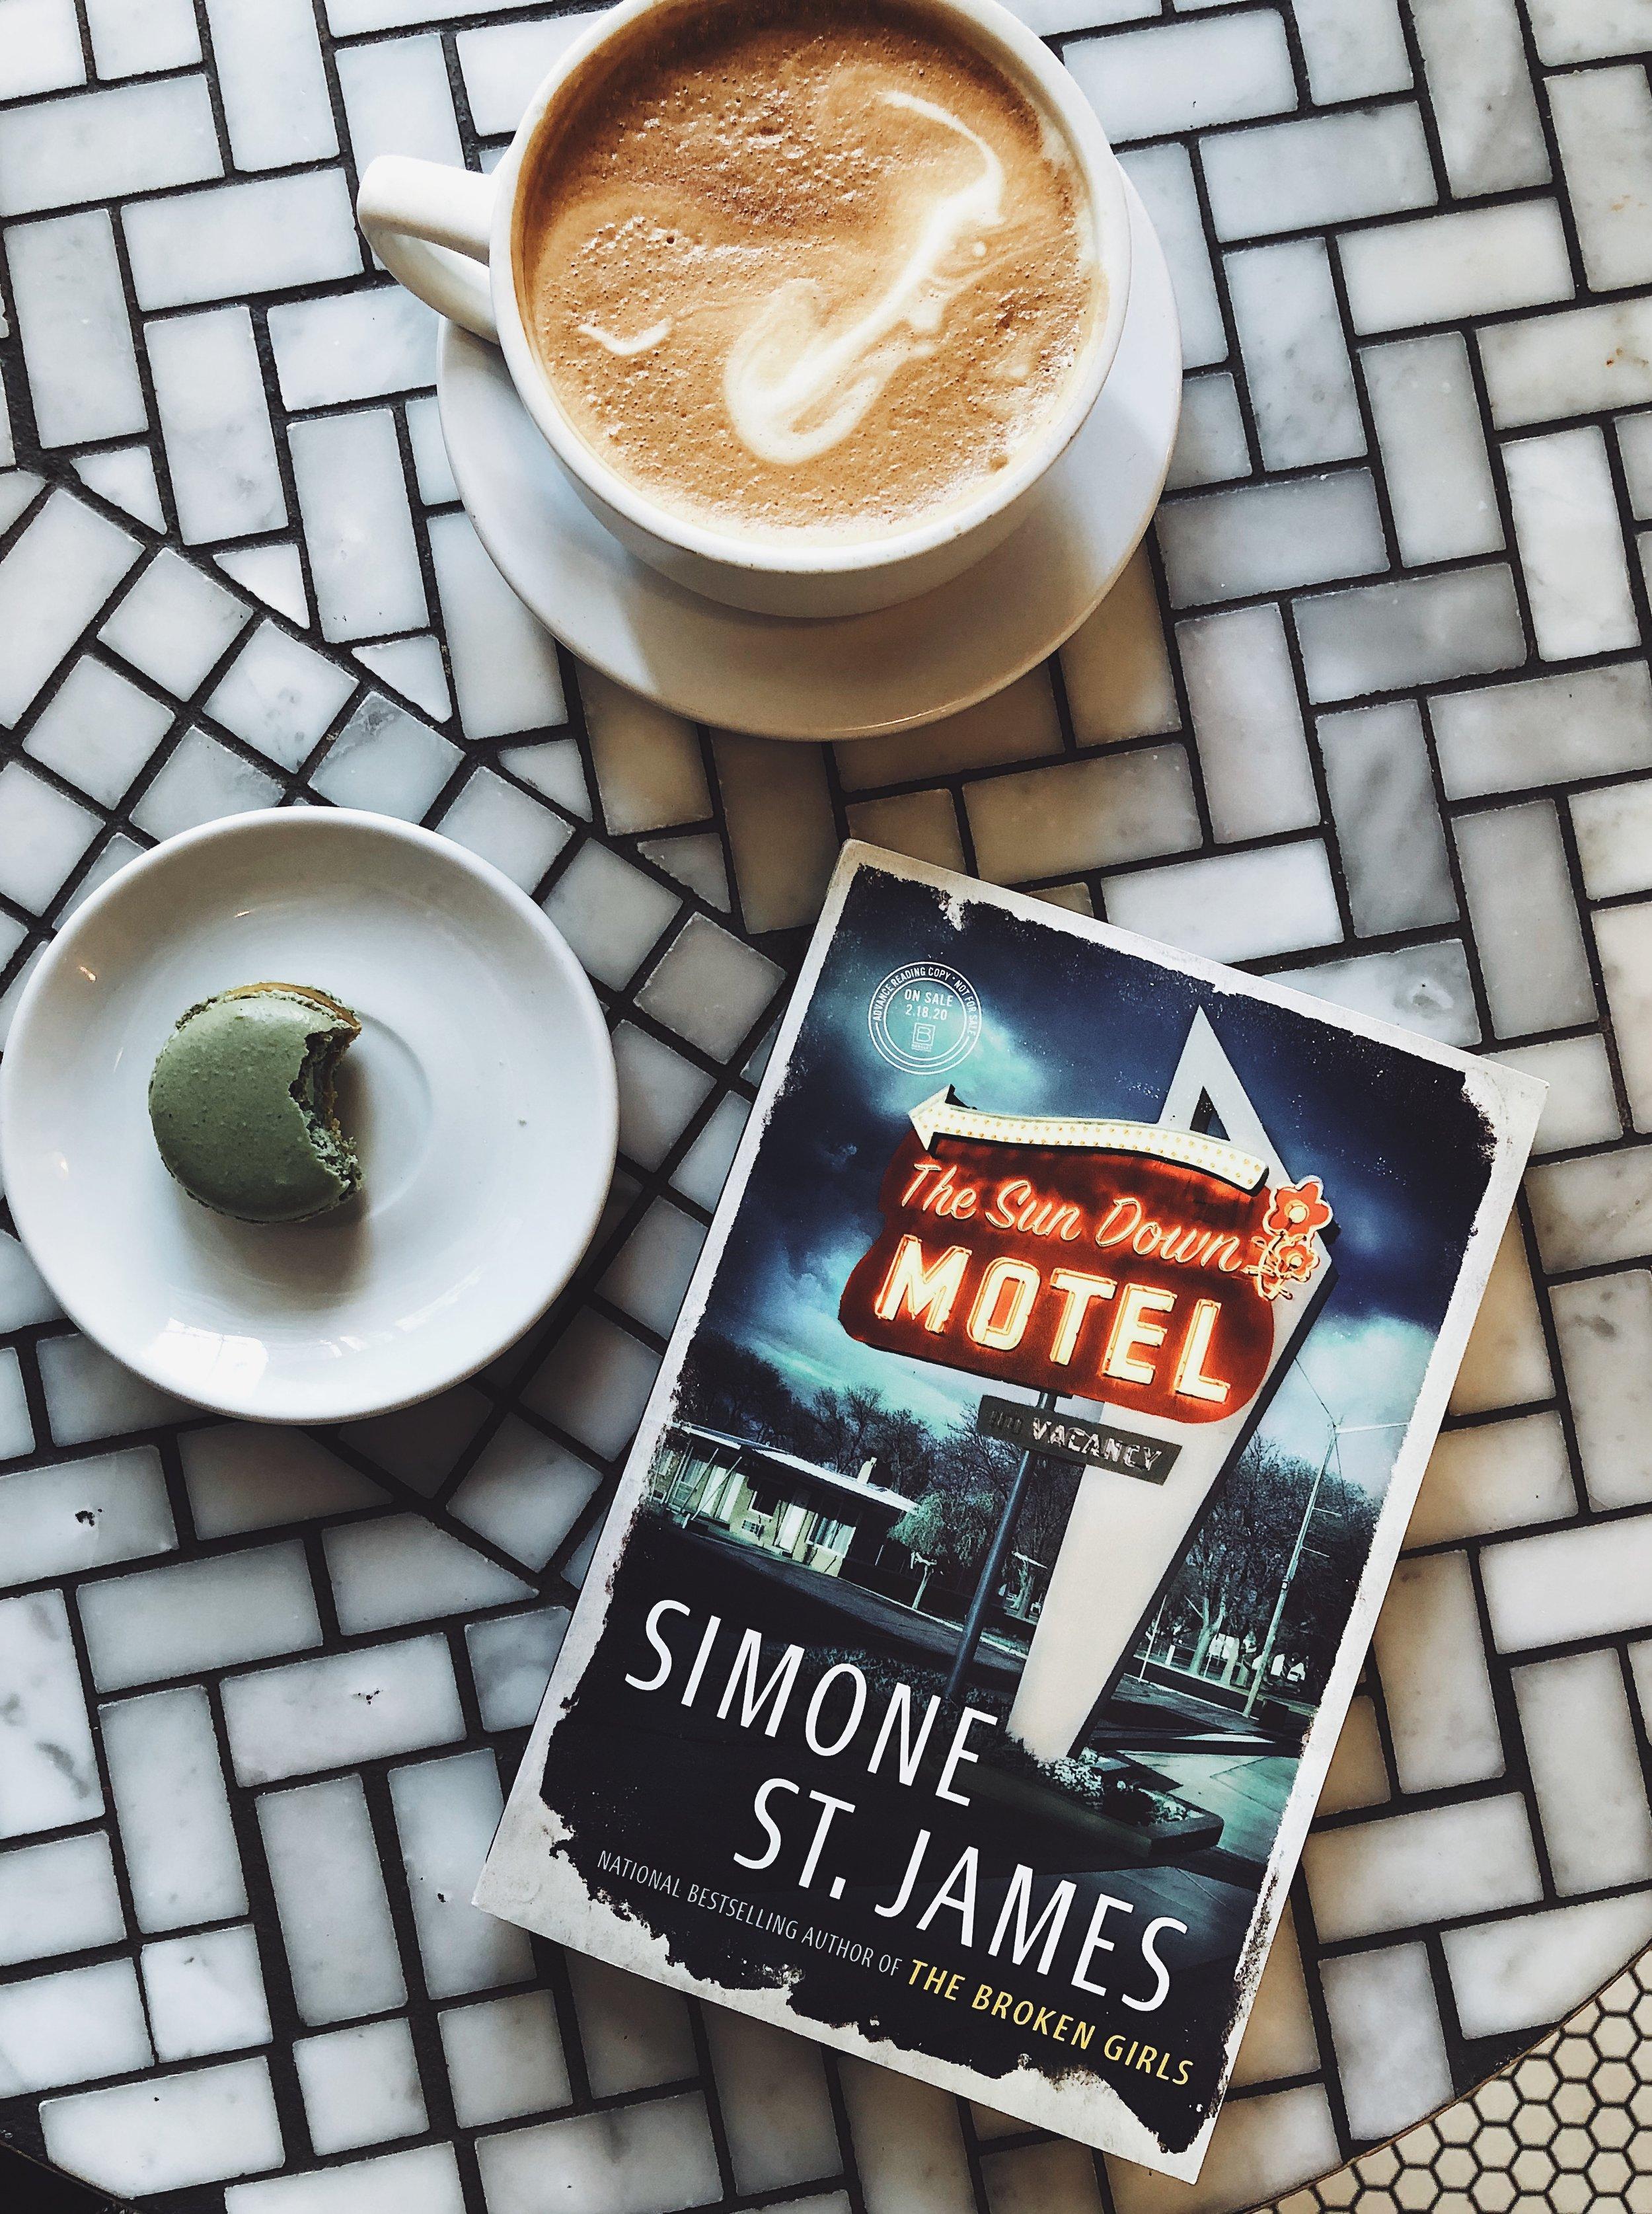 The Sun Down Motel Simone St. James 2.JPG